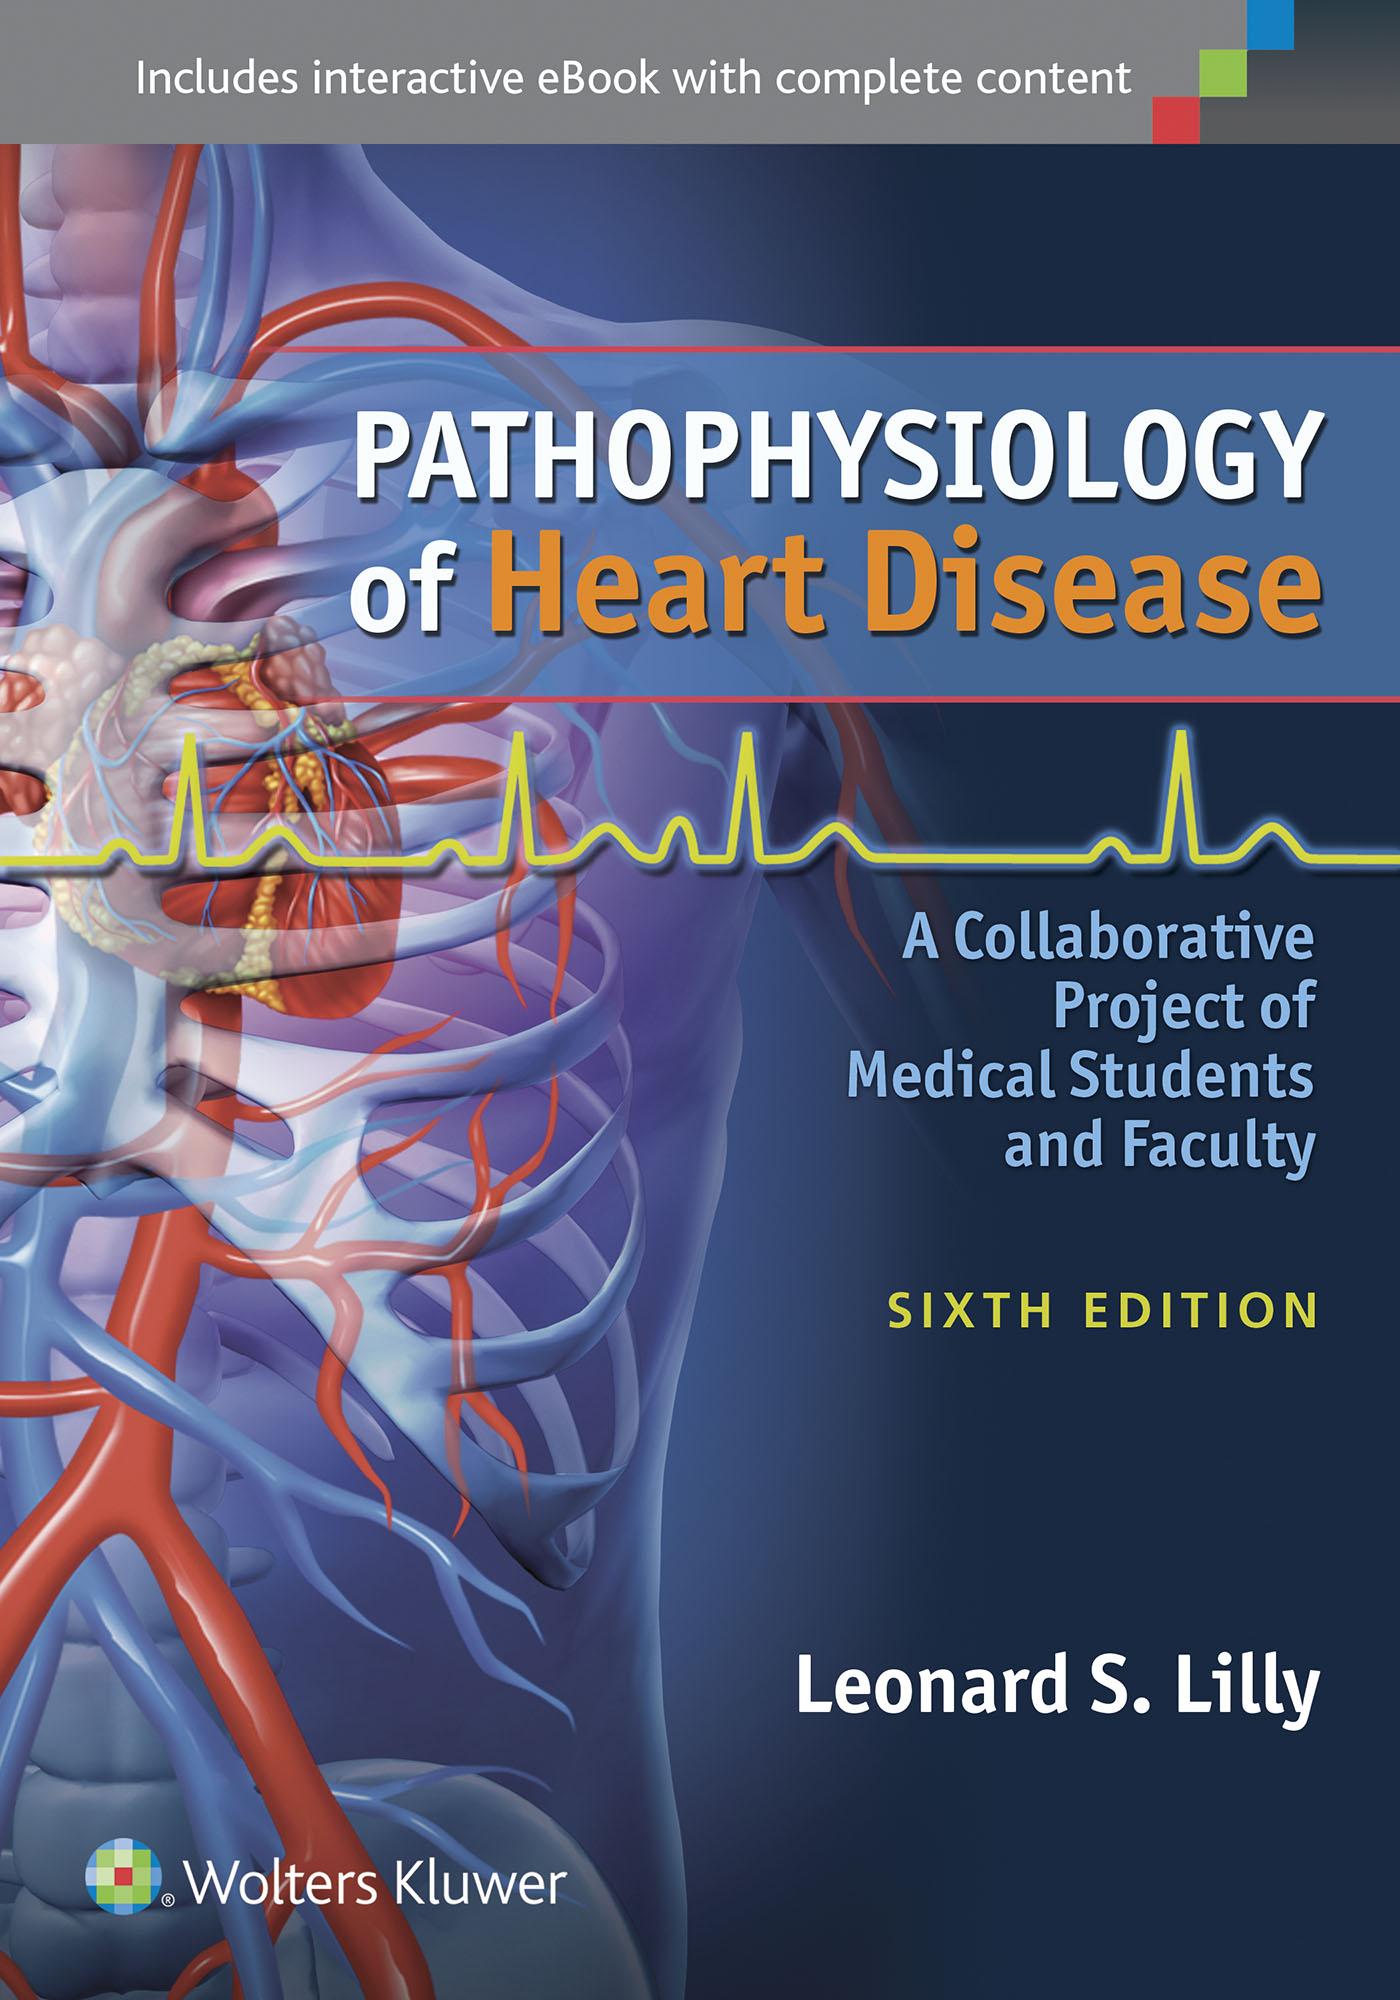 Großartig Anatomy And Physiology Made Incredibly Easy Ebook ...